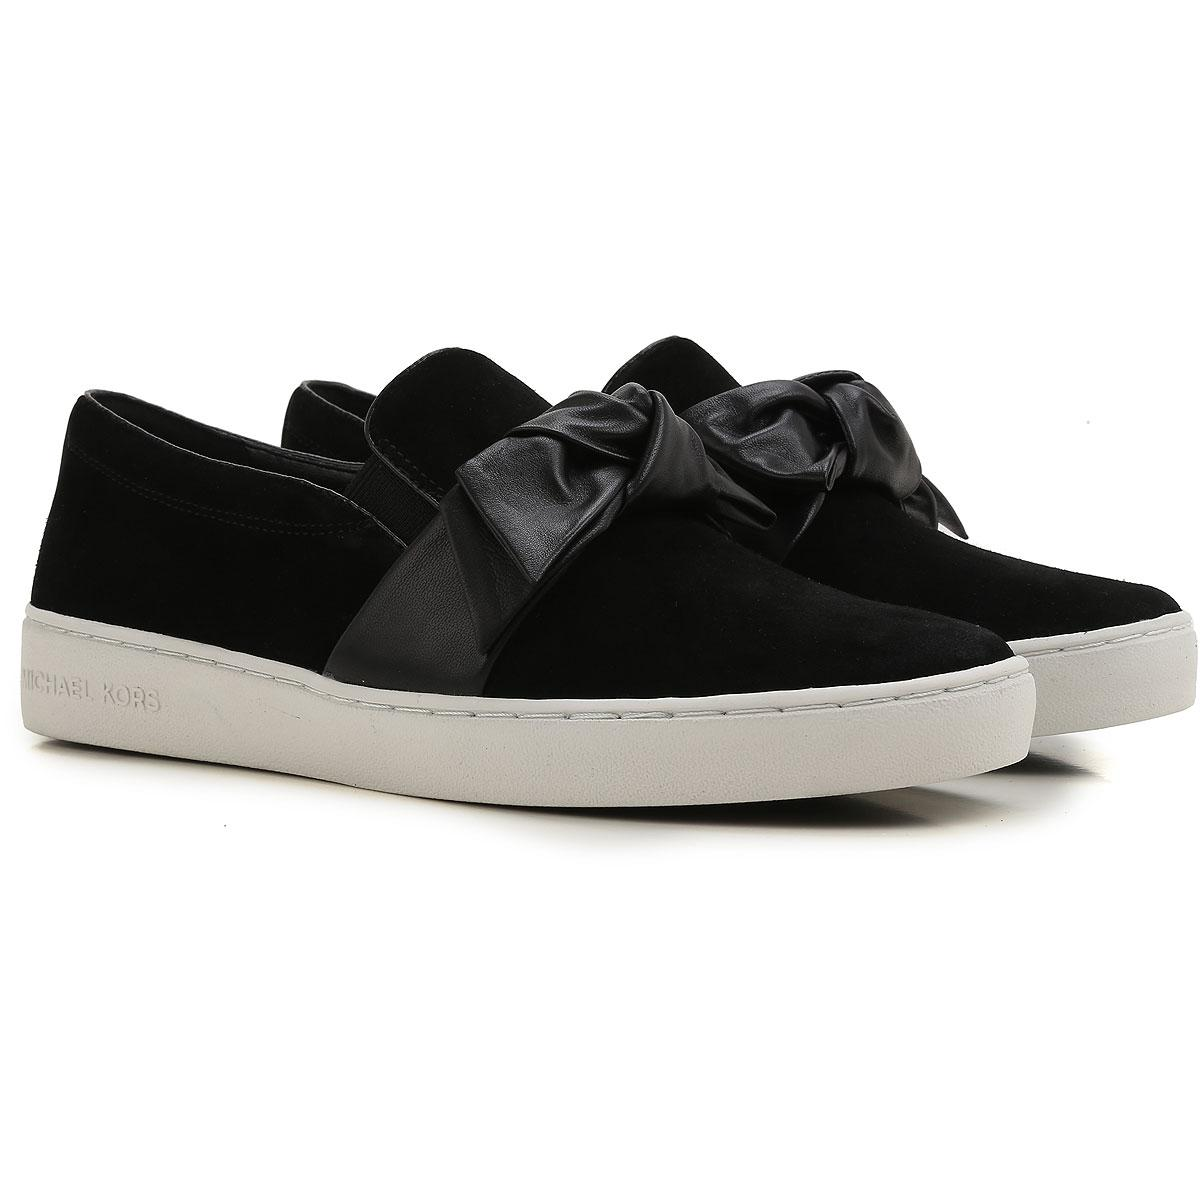 3d03e42eb075 Michael Kors - Black Slip On Sneakers For Women On Sale In Outlet - Lyst